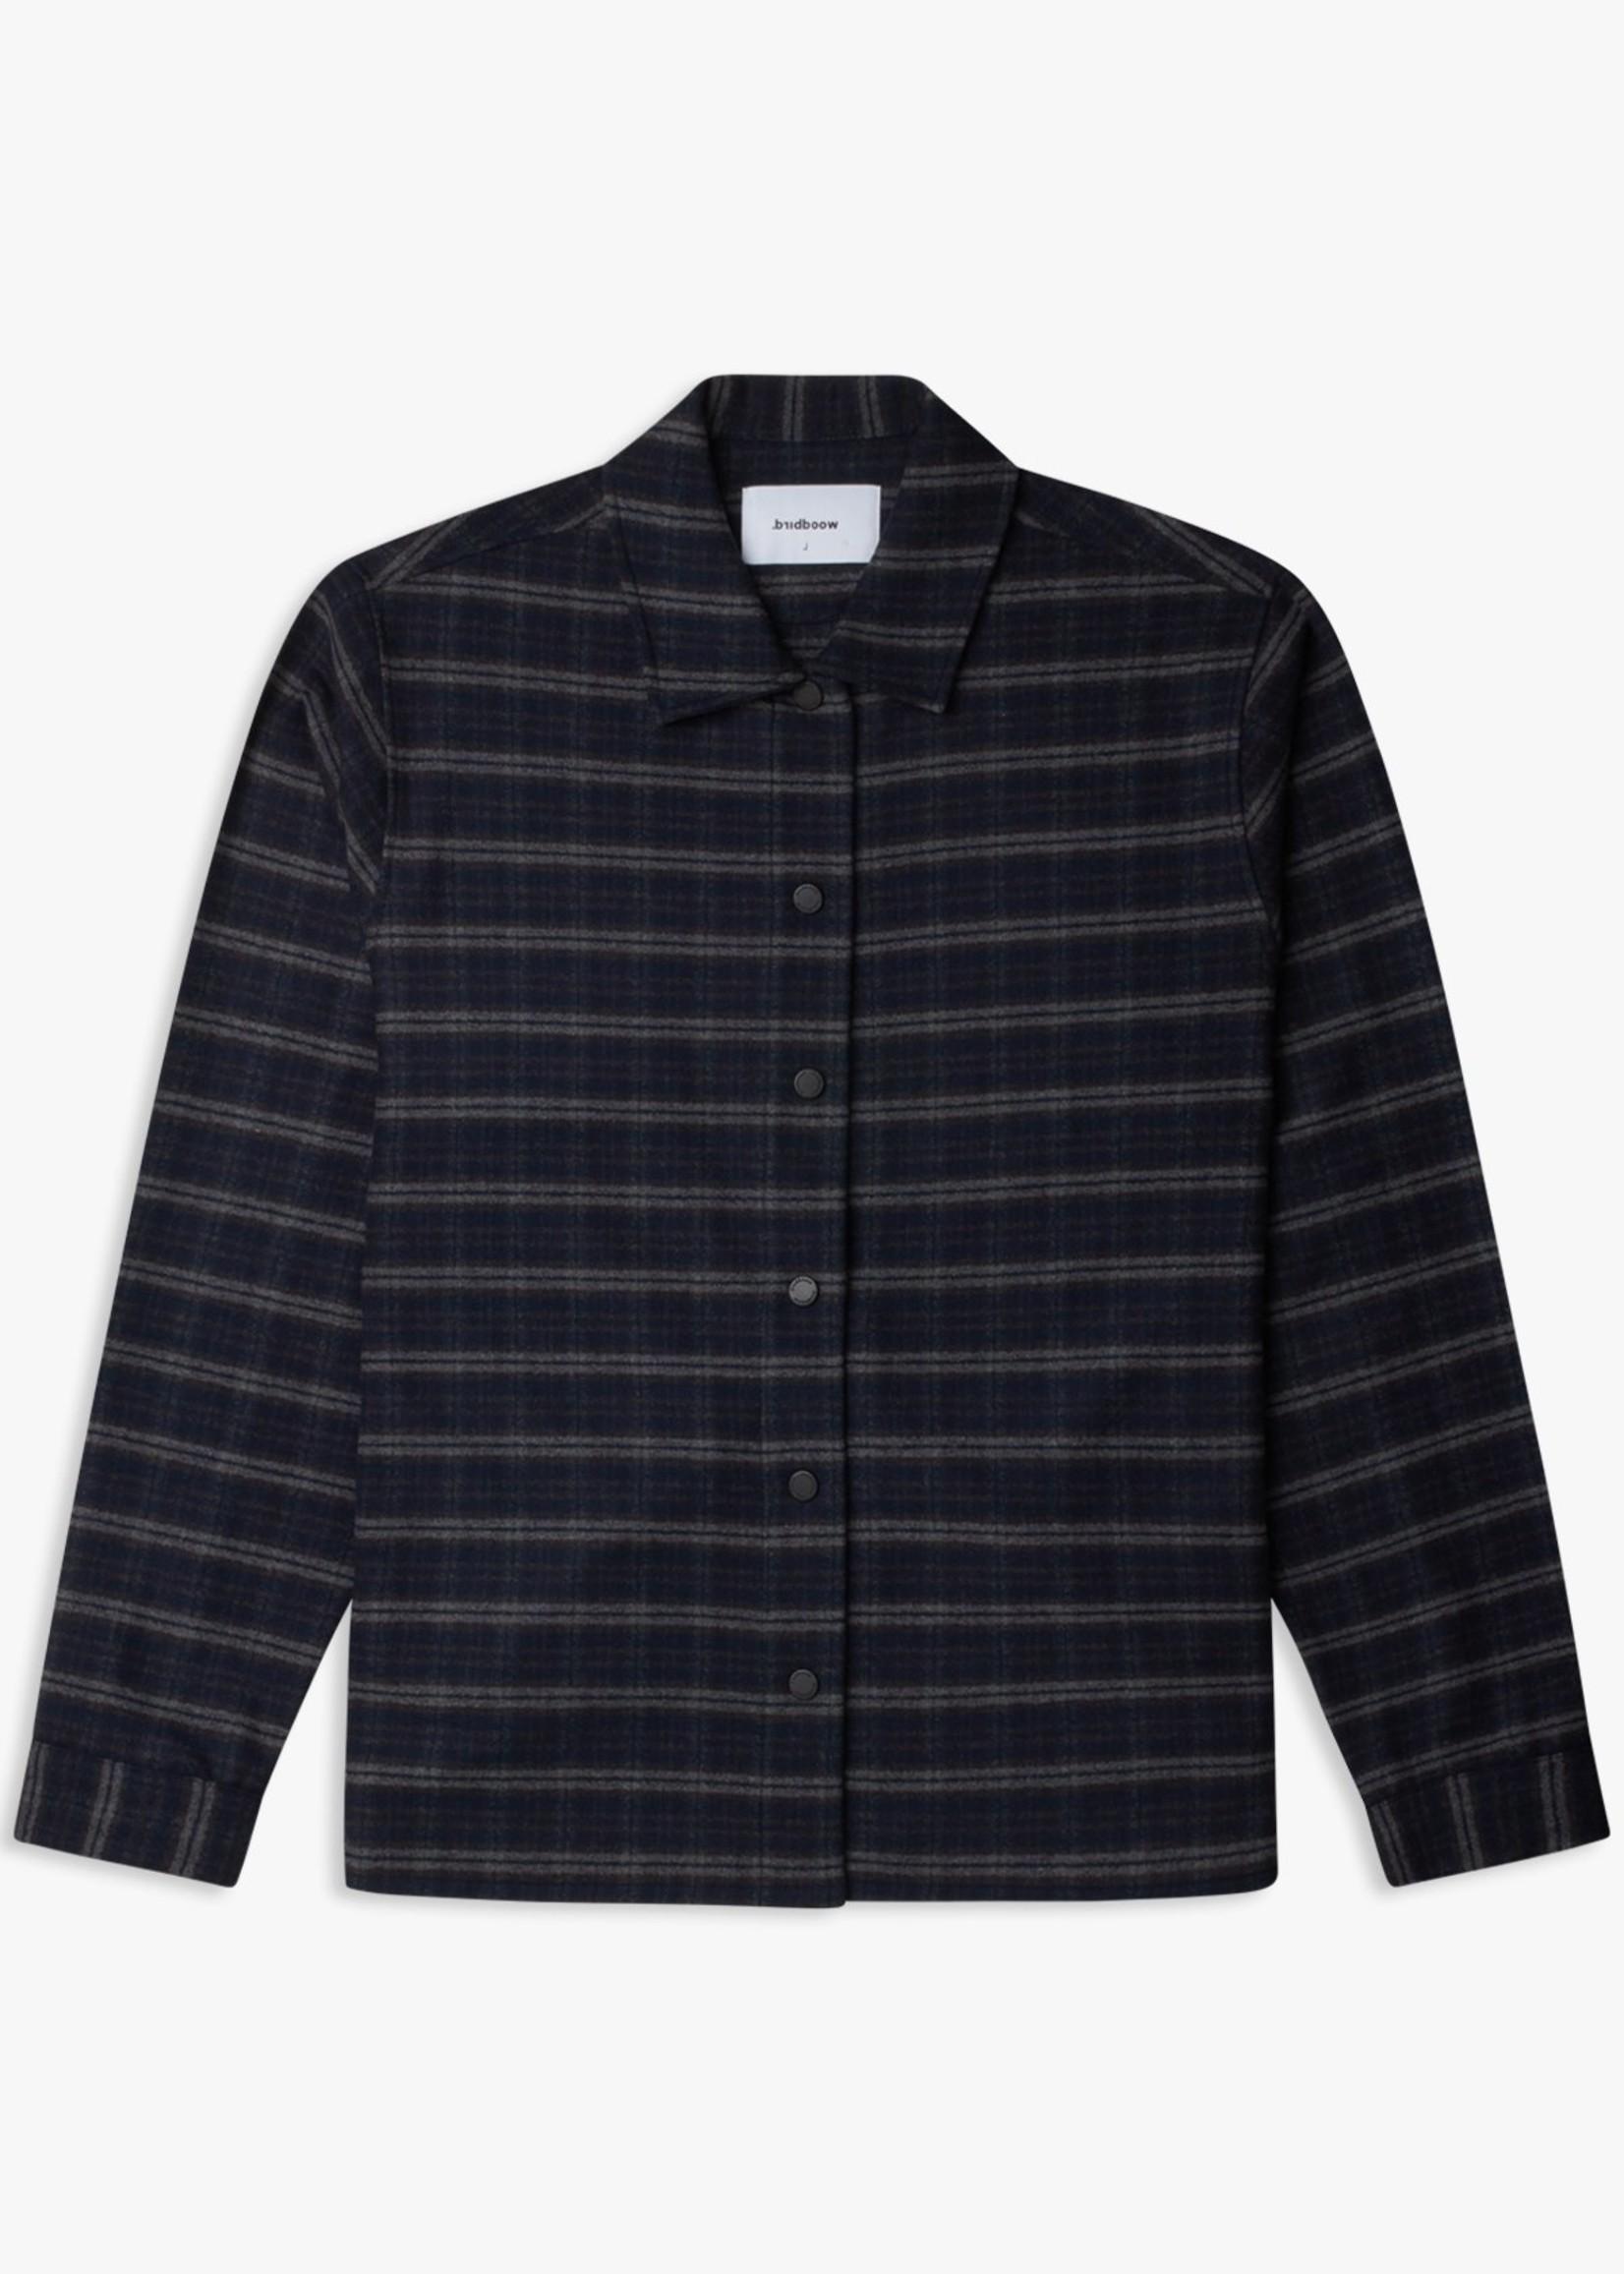 Woodbird Jaxo Check Shirt